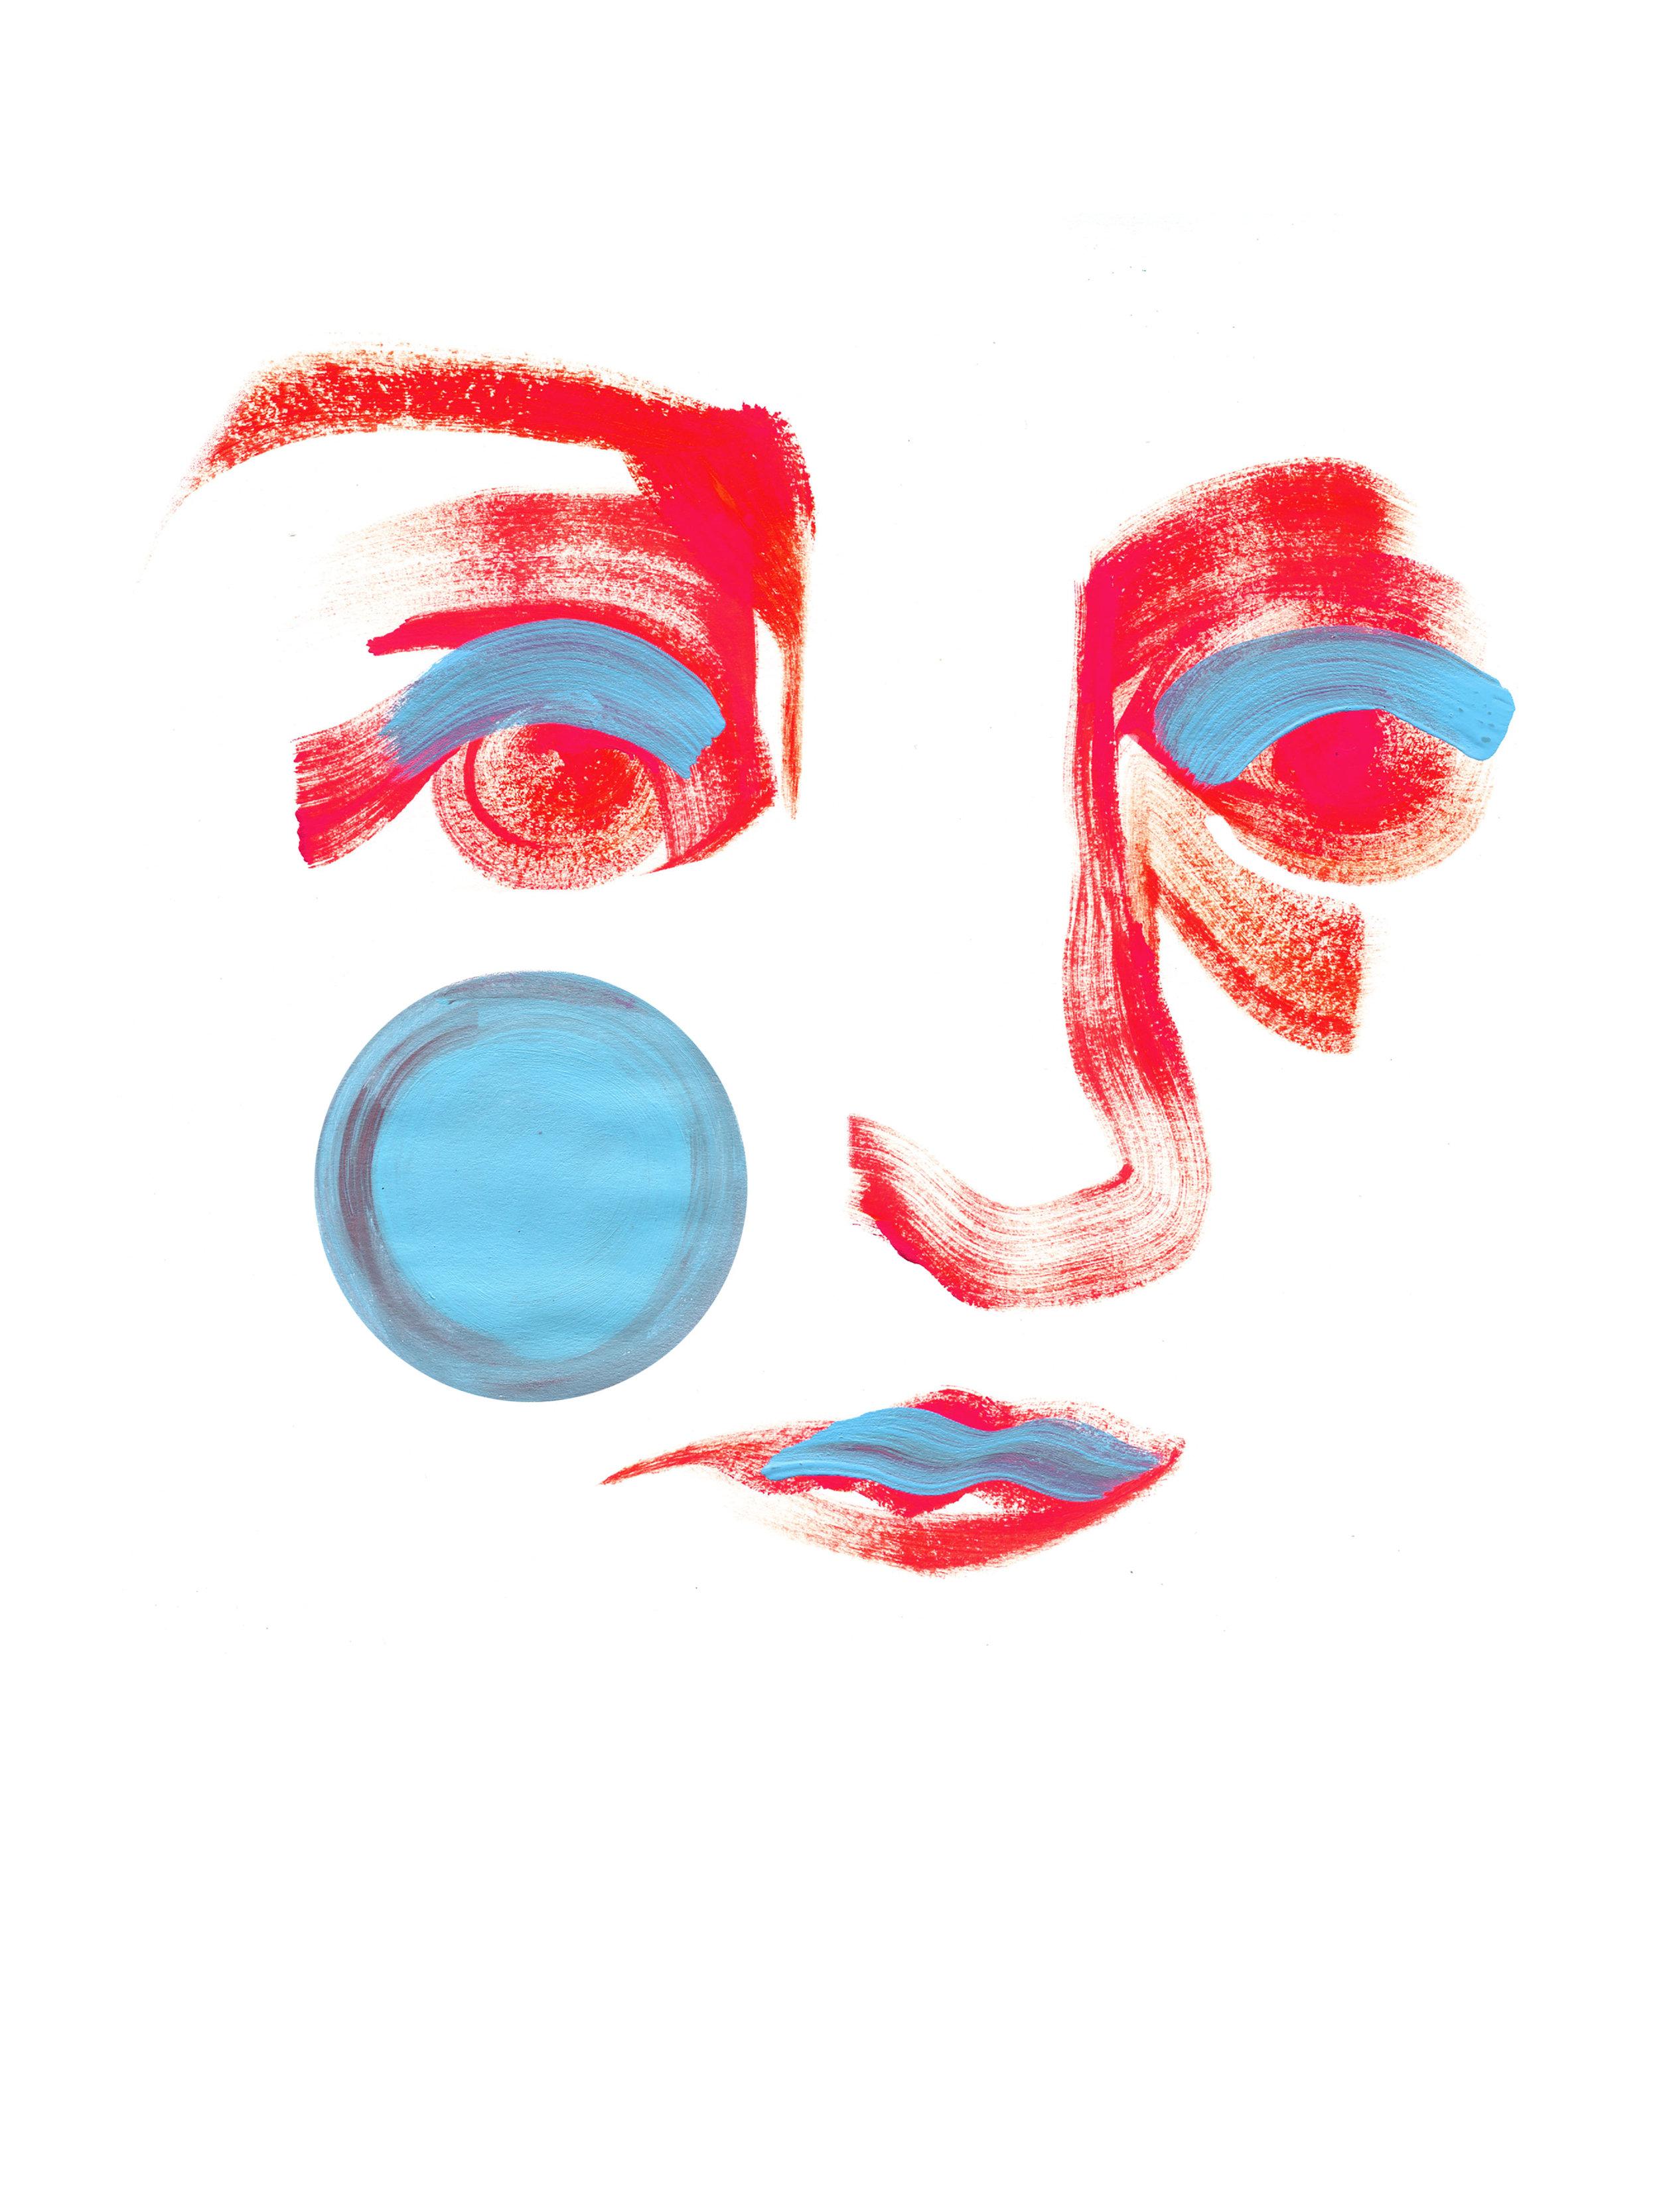 LD_Redface.jpg